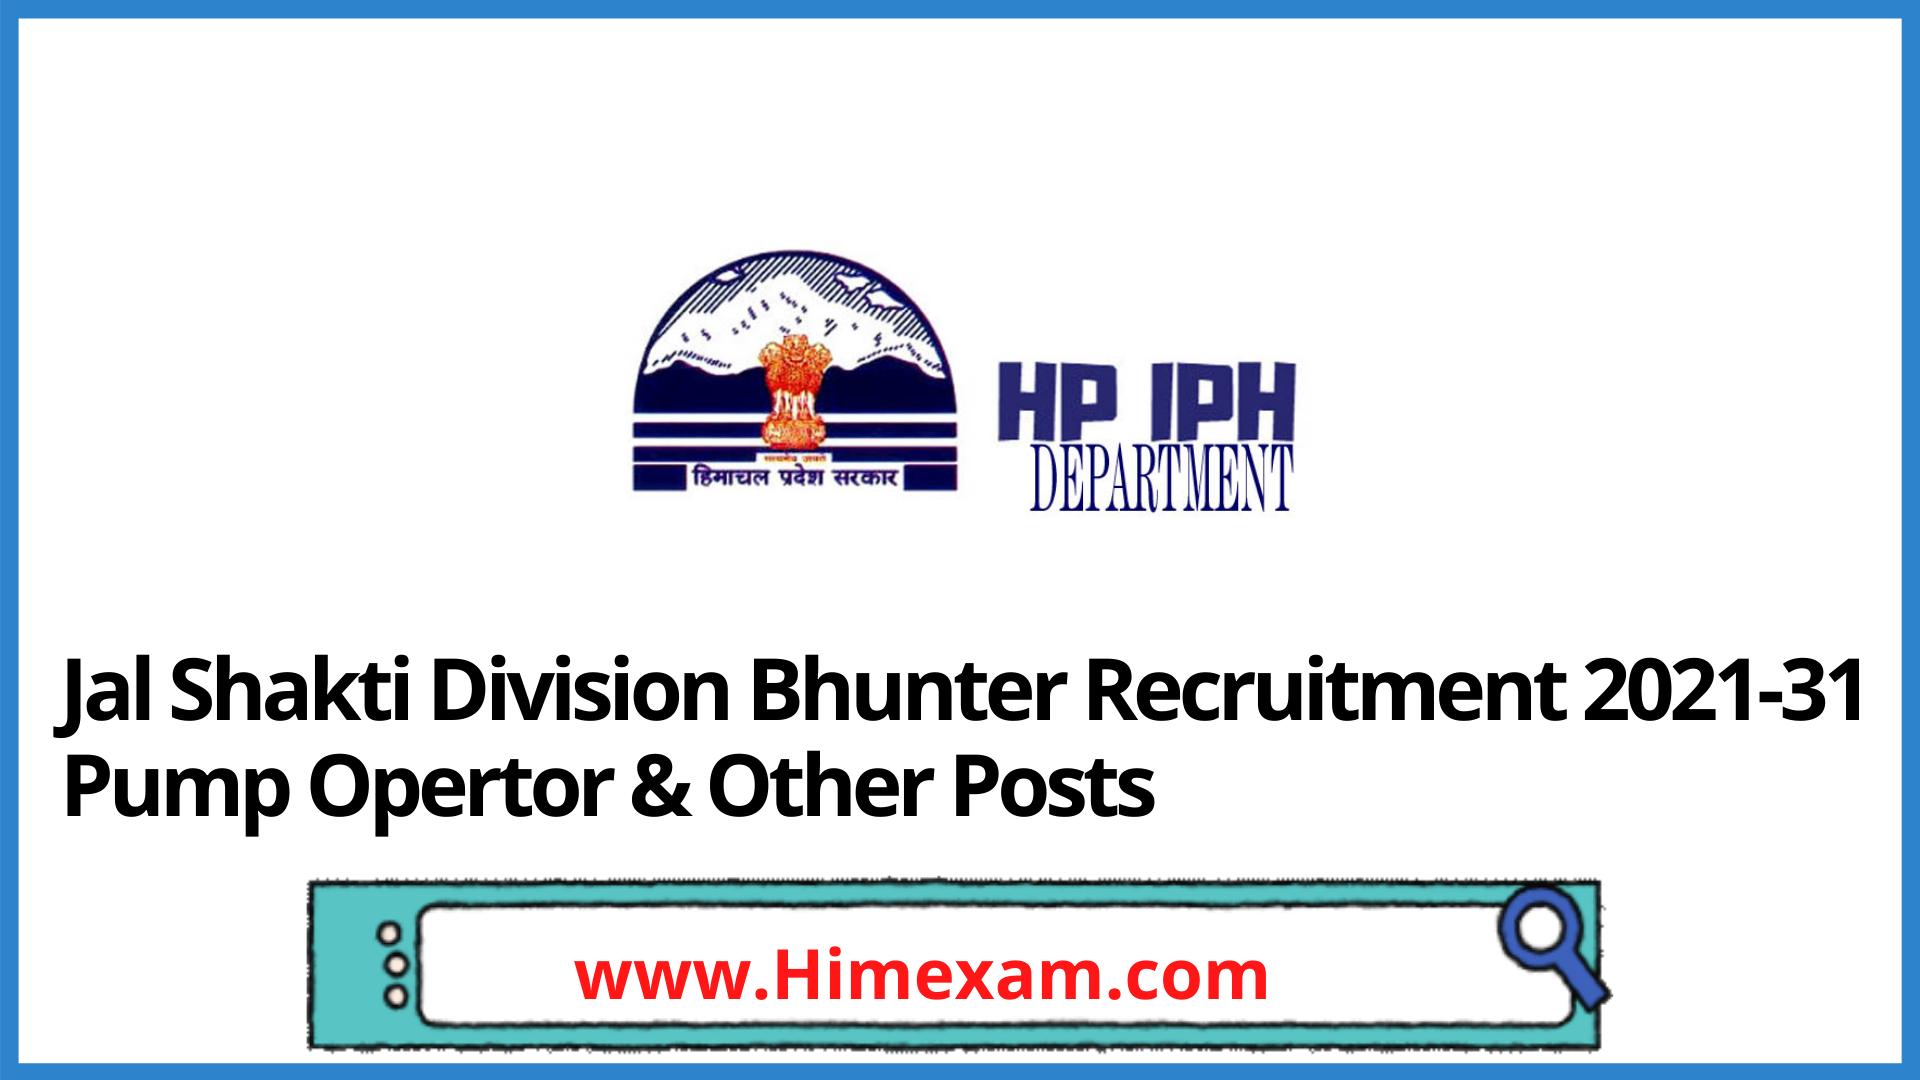 Jal Shakti Division Bhunter Recruitment 2021-31 Pump Opertor & Other Posts